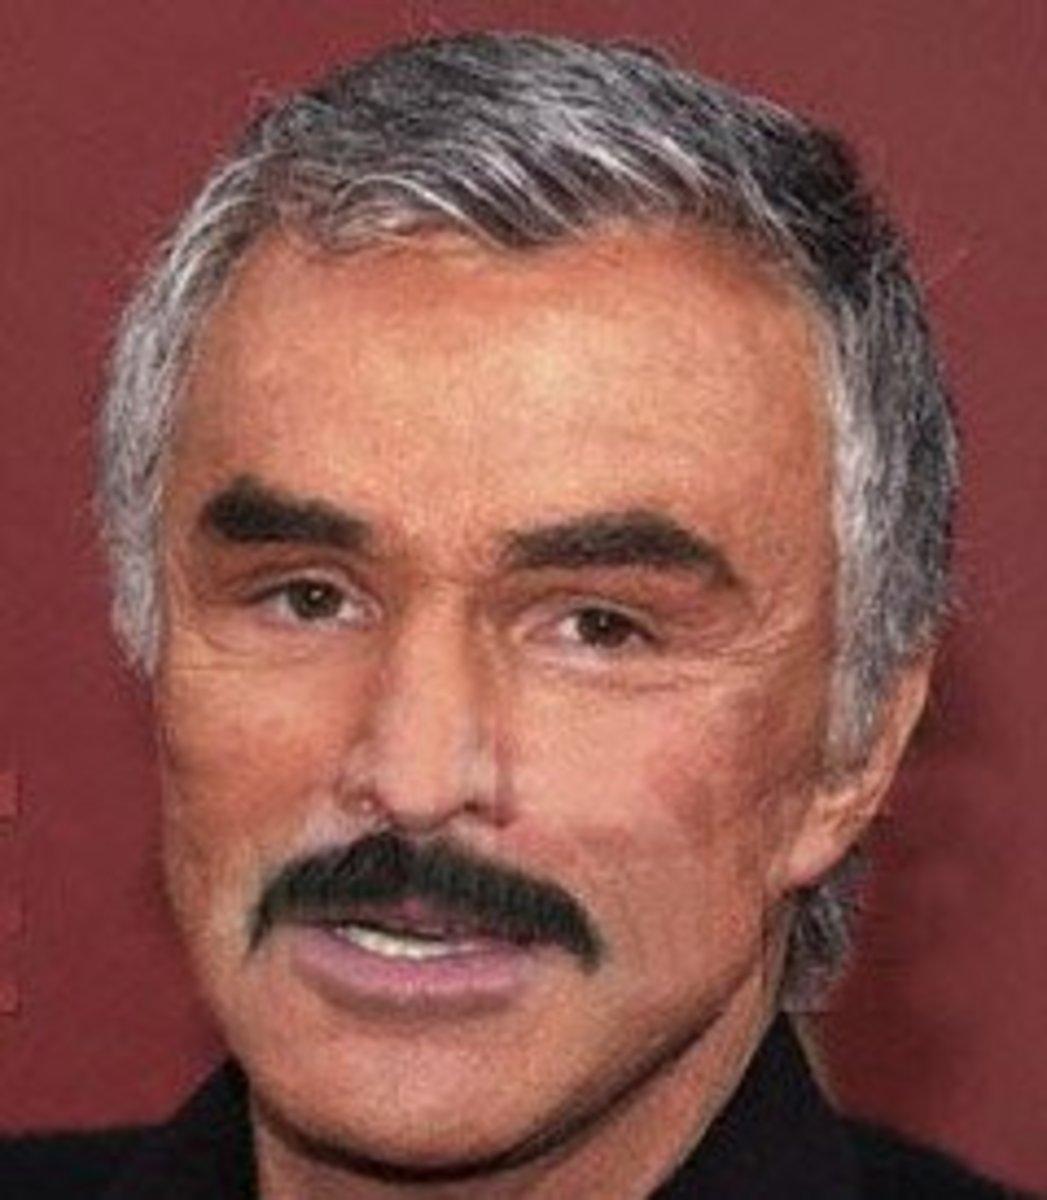 Burt Reynolds with a salt 'n pepper toupee